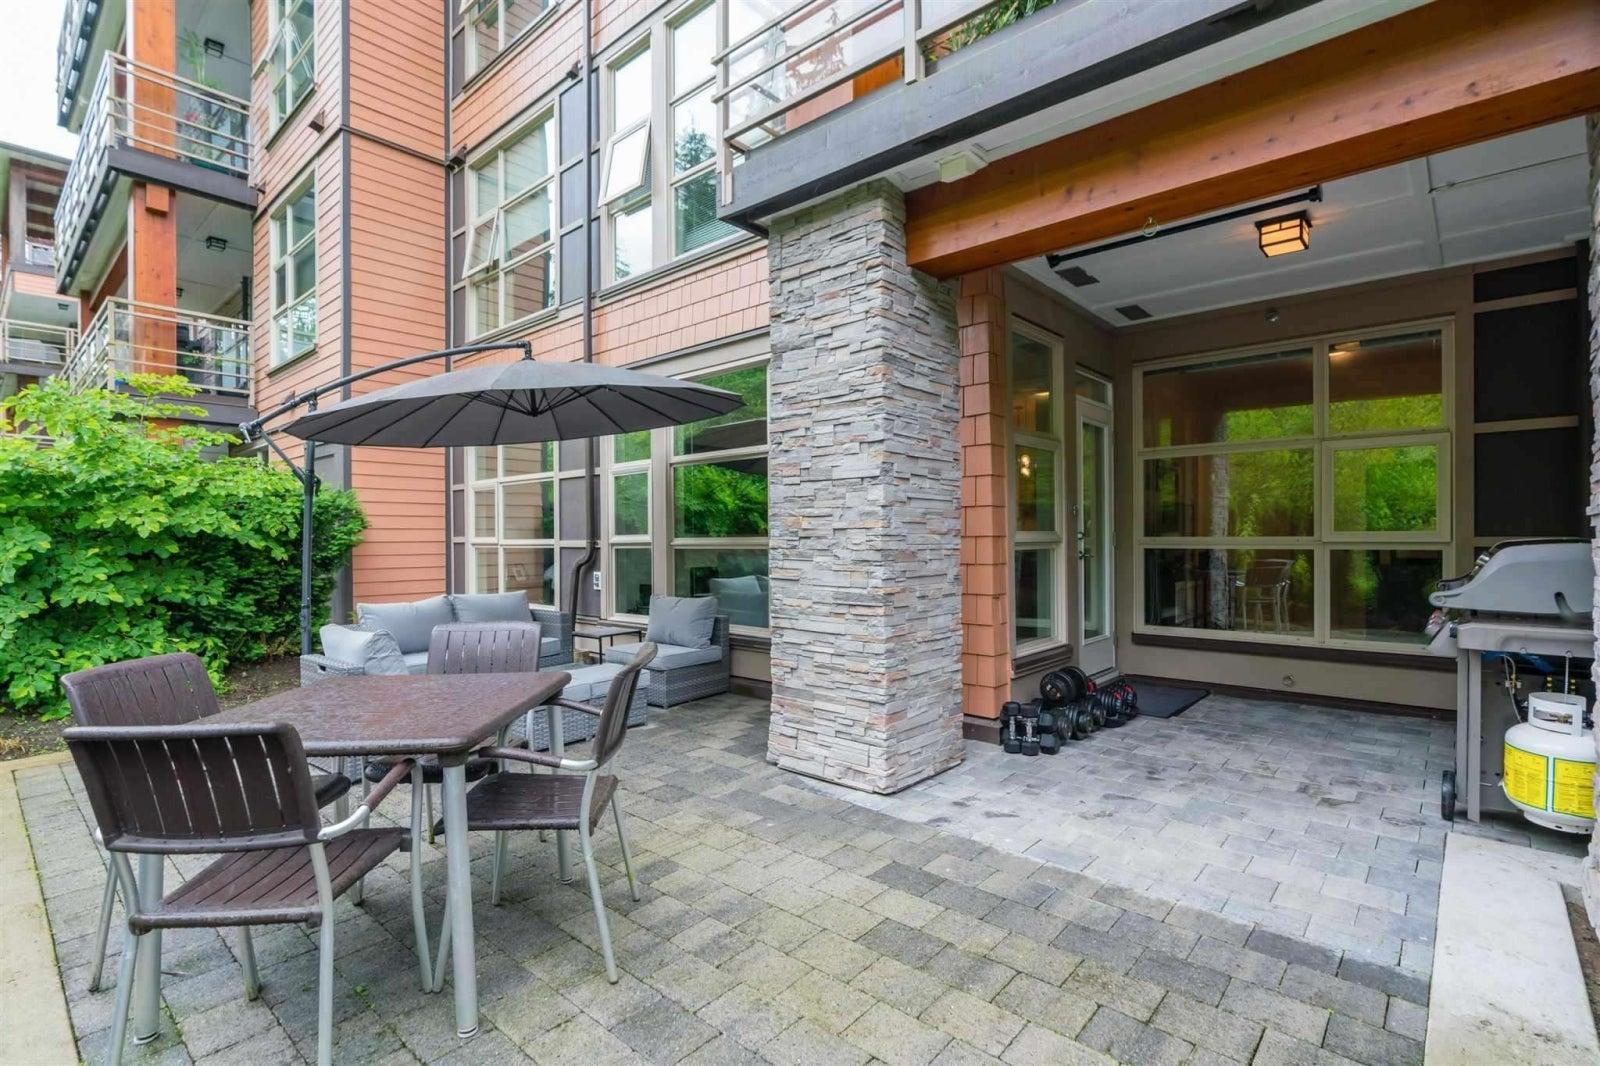 222 3602 ALDERCREST DRIVE - Roche Point Apartment/Condo for sale, 2 Bedrooms (R2603975) #16